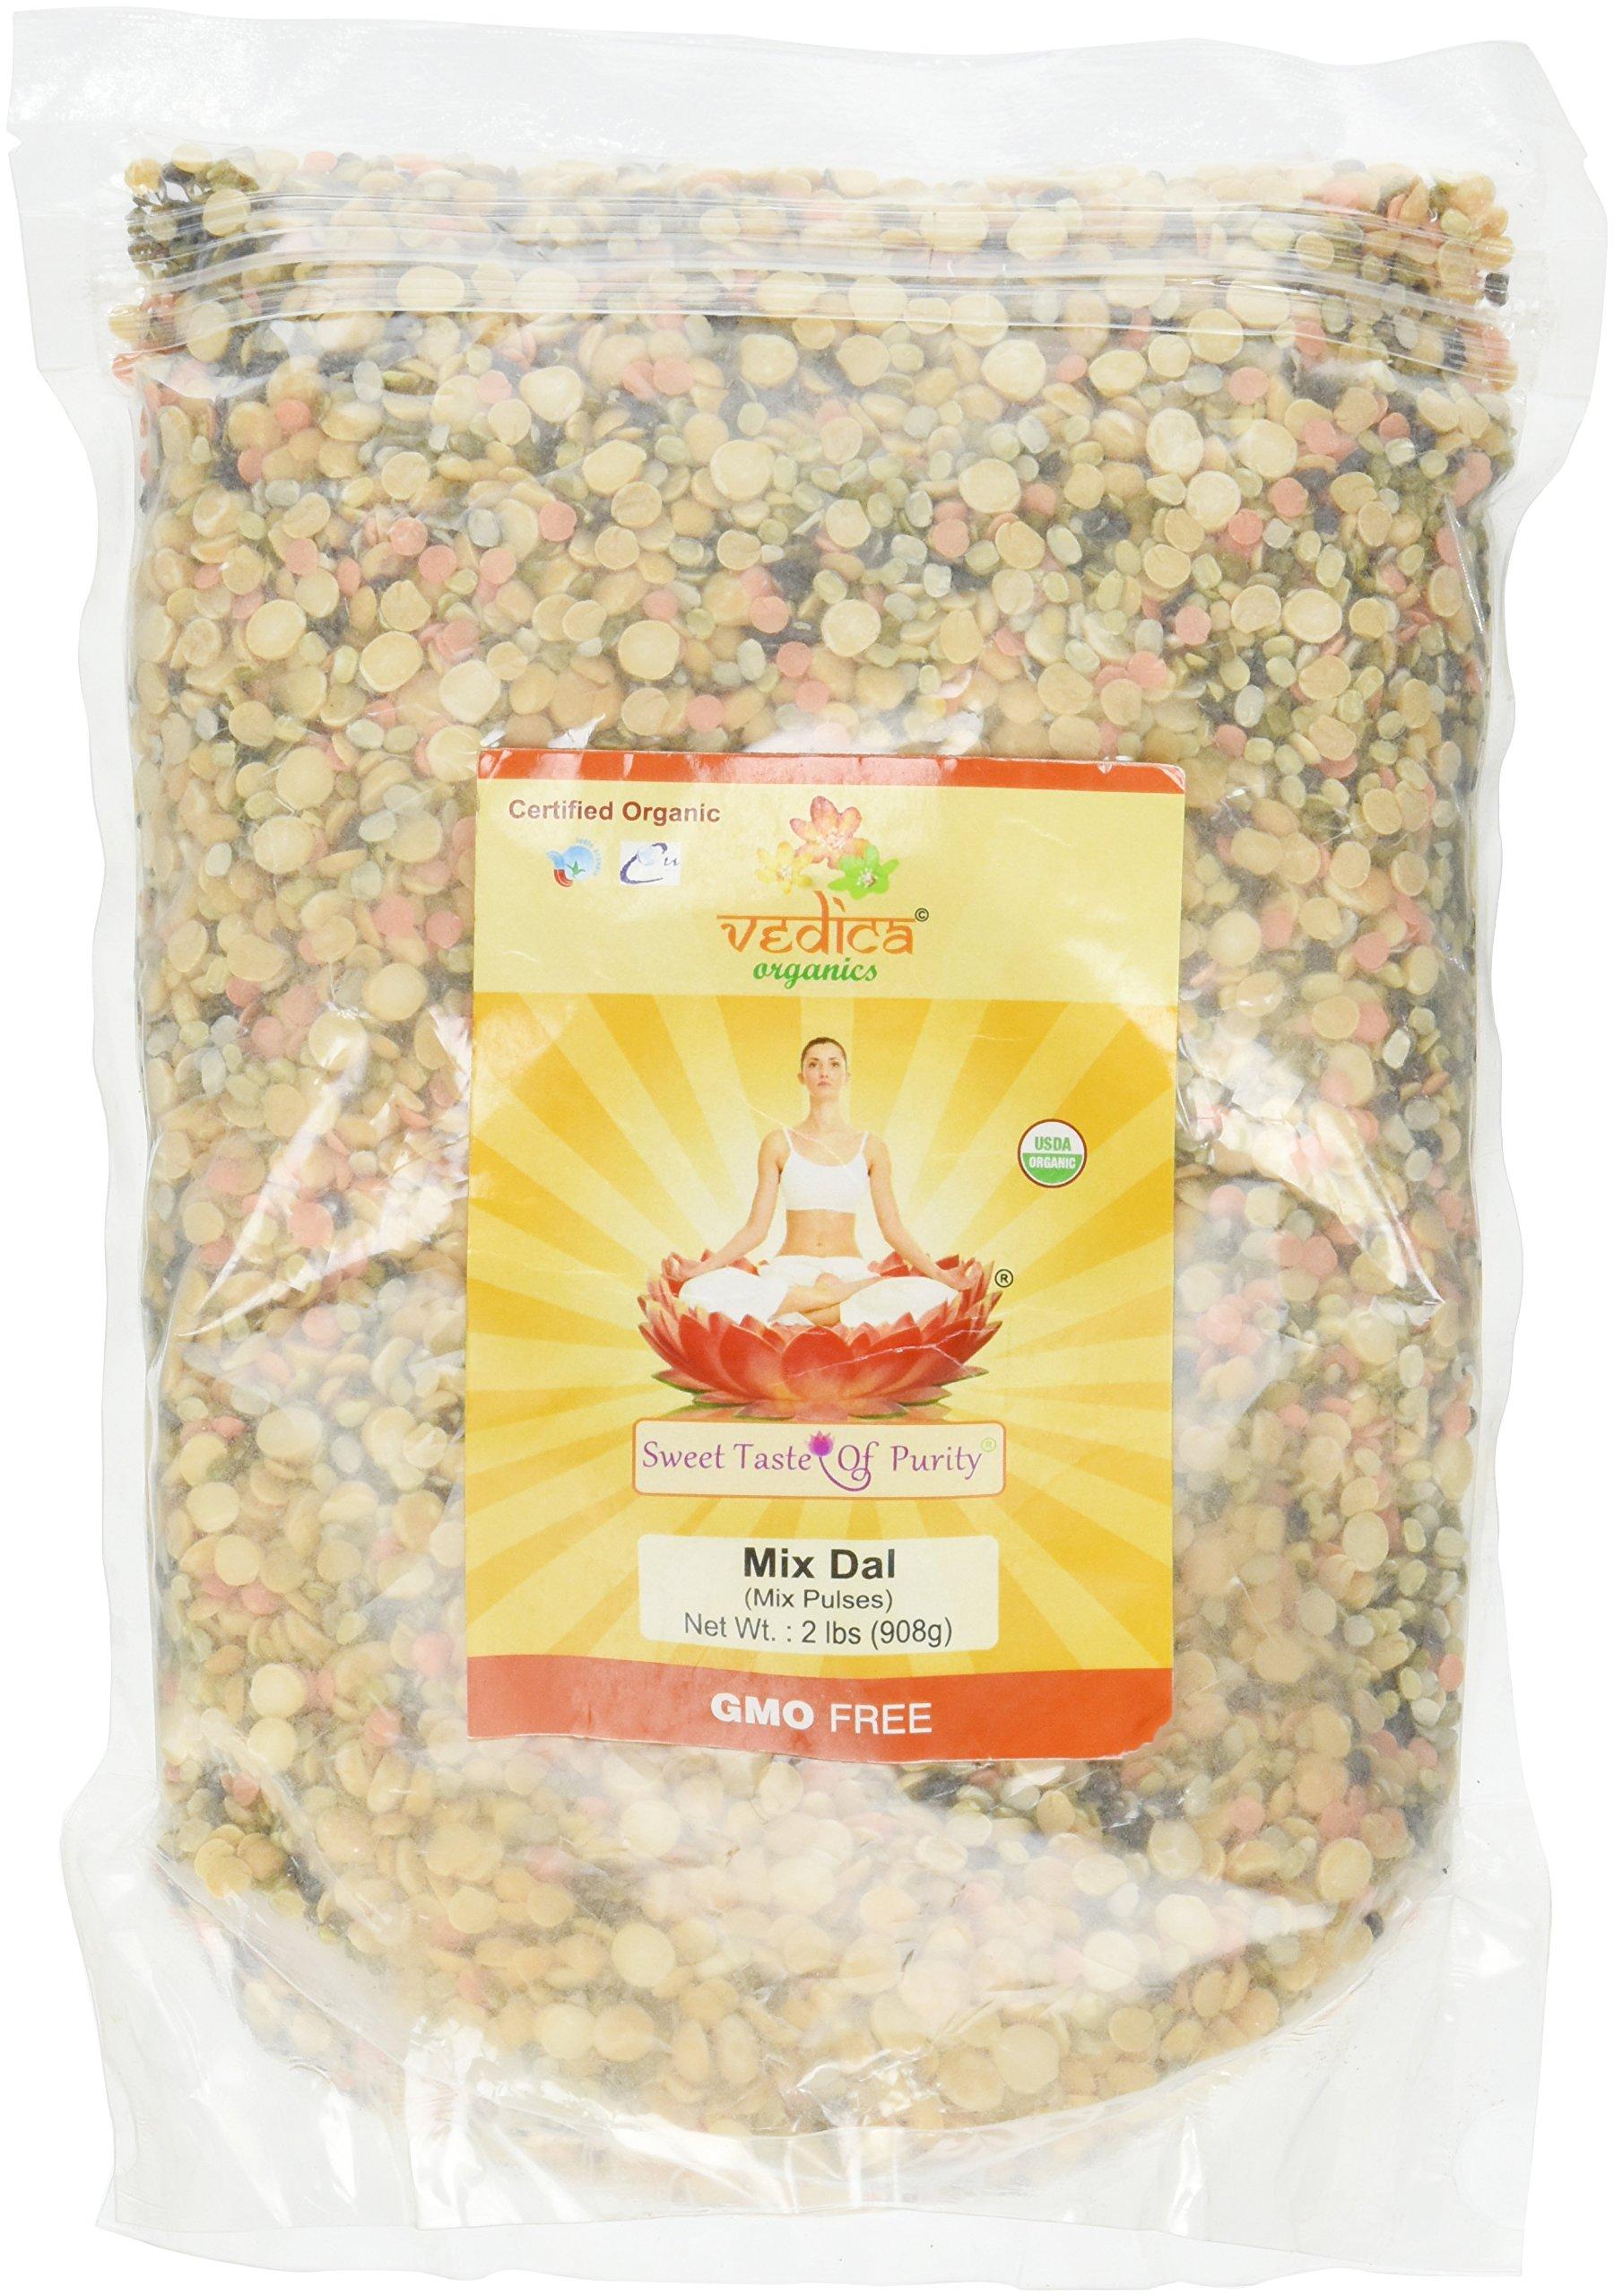 Organic Mixed Dal by Vedica Organics